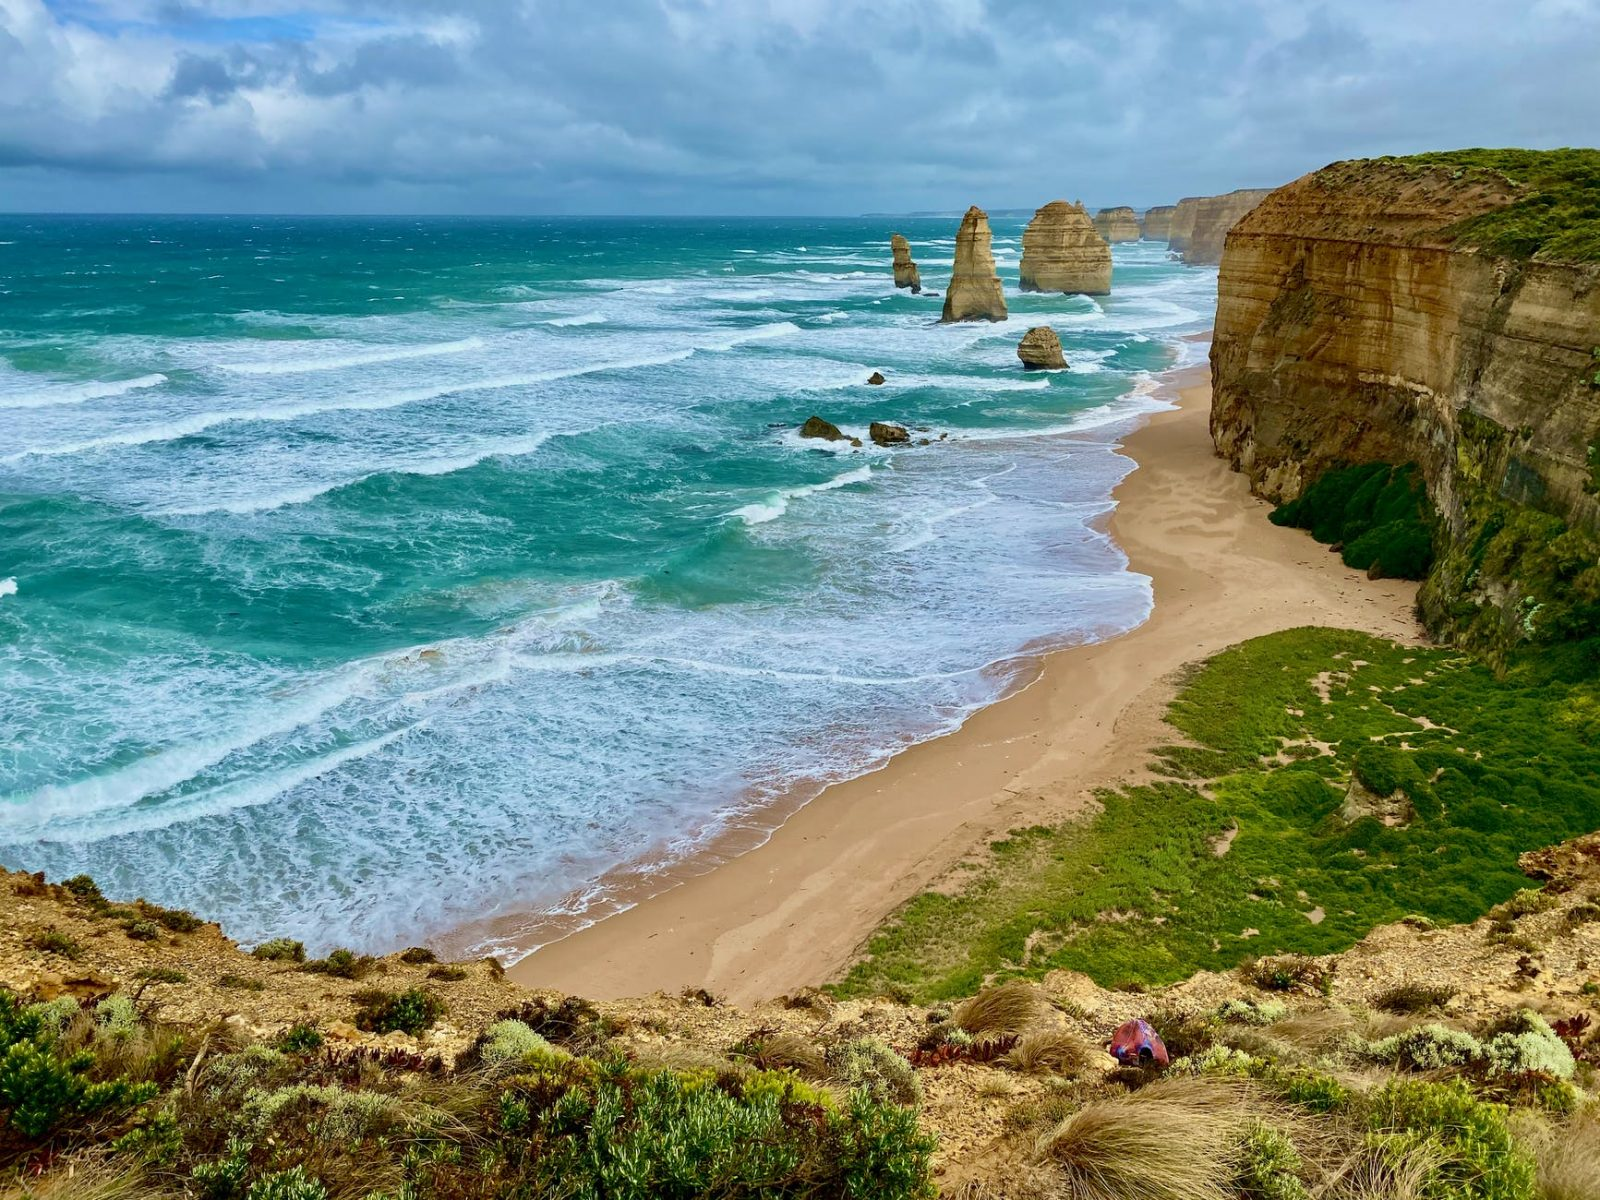 Australia Beach at Christmas Holiday Traditions